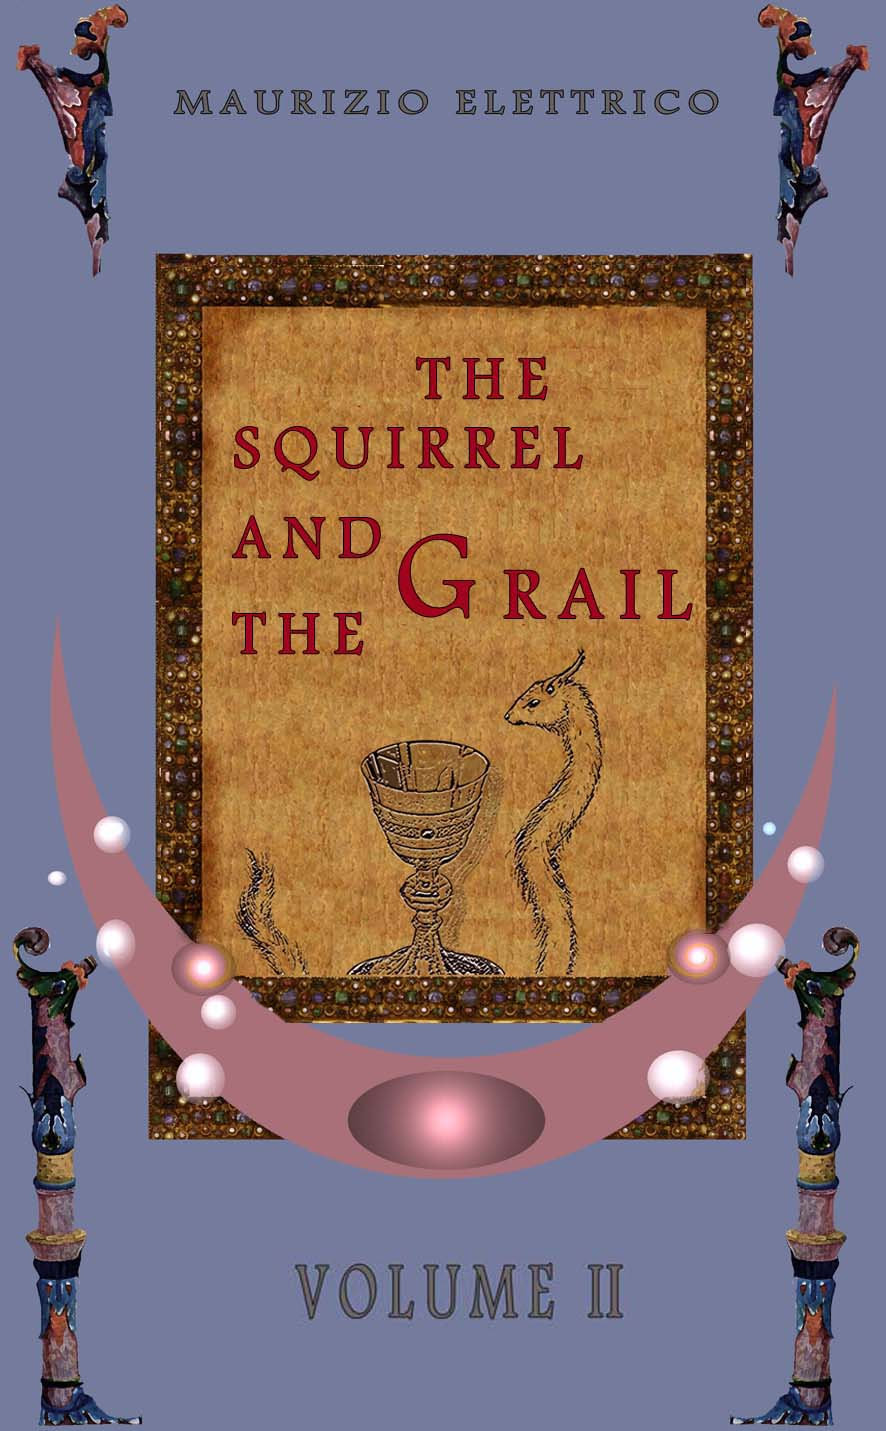 The squirrel and the Grail, Maurizio Elettrico, fantasy book, epic fantasy, science fiction, cyborg, new religions